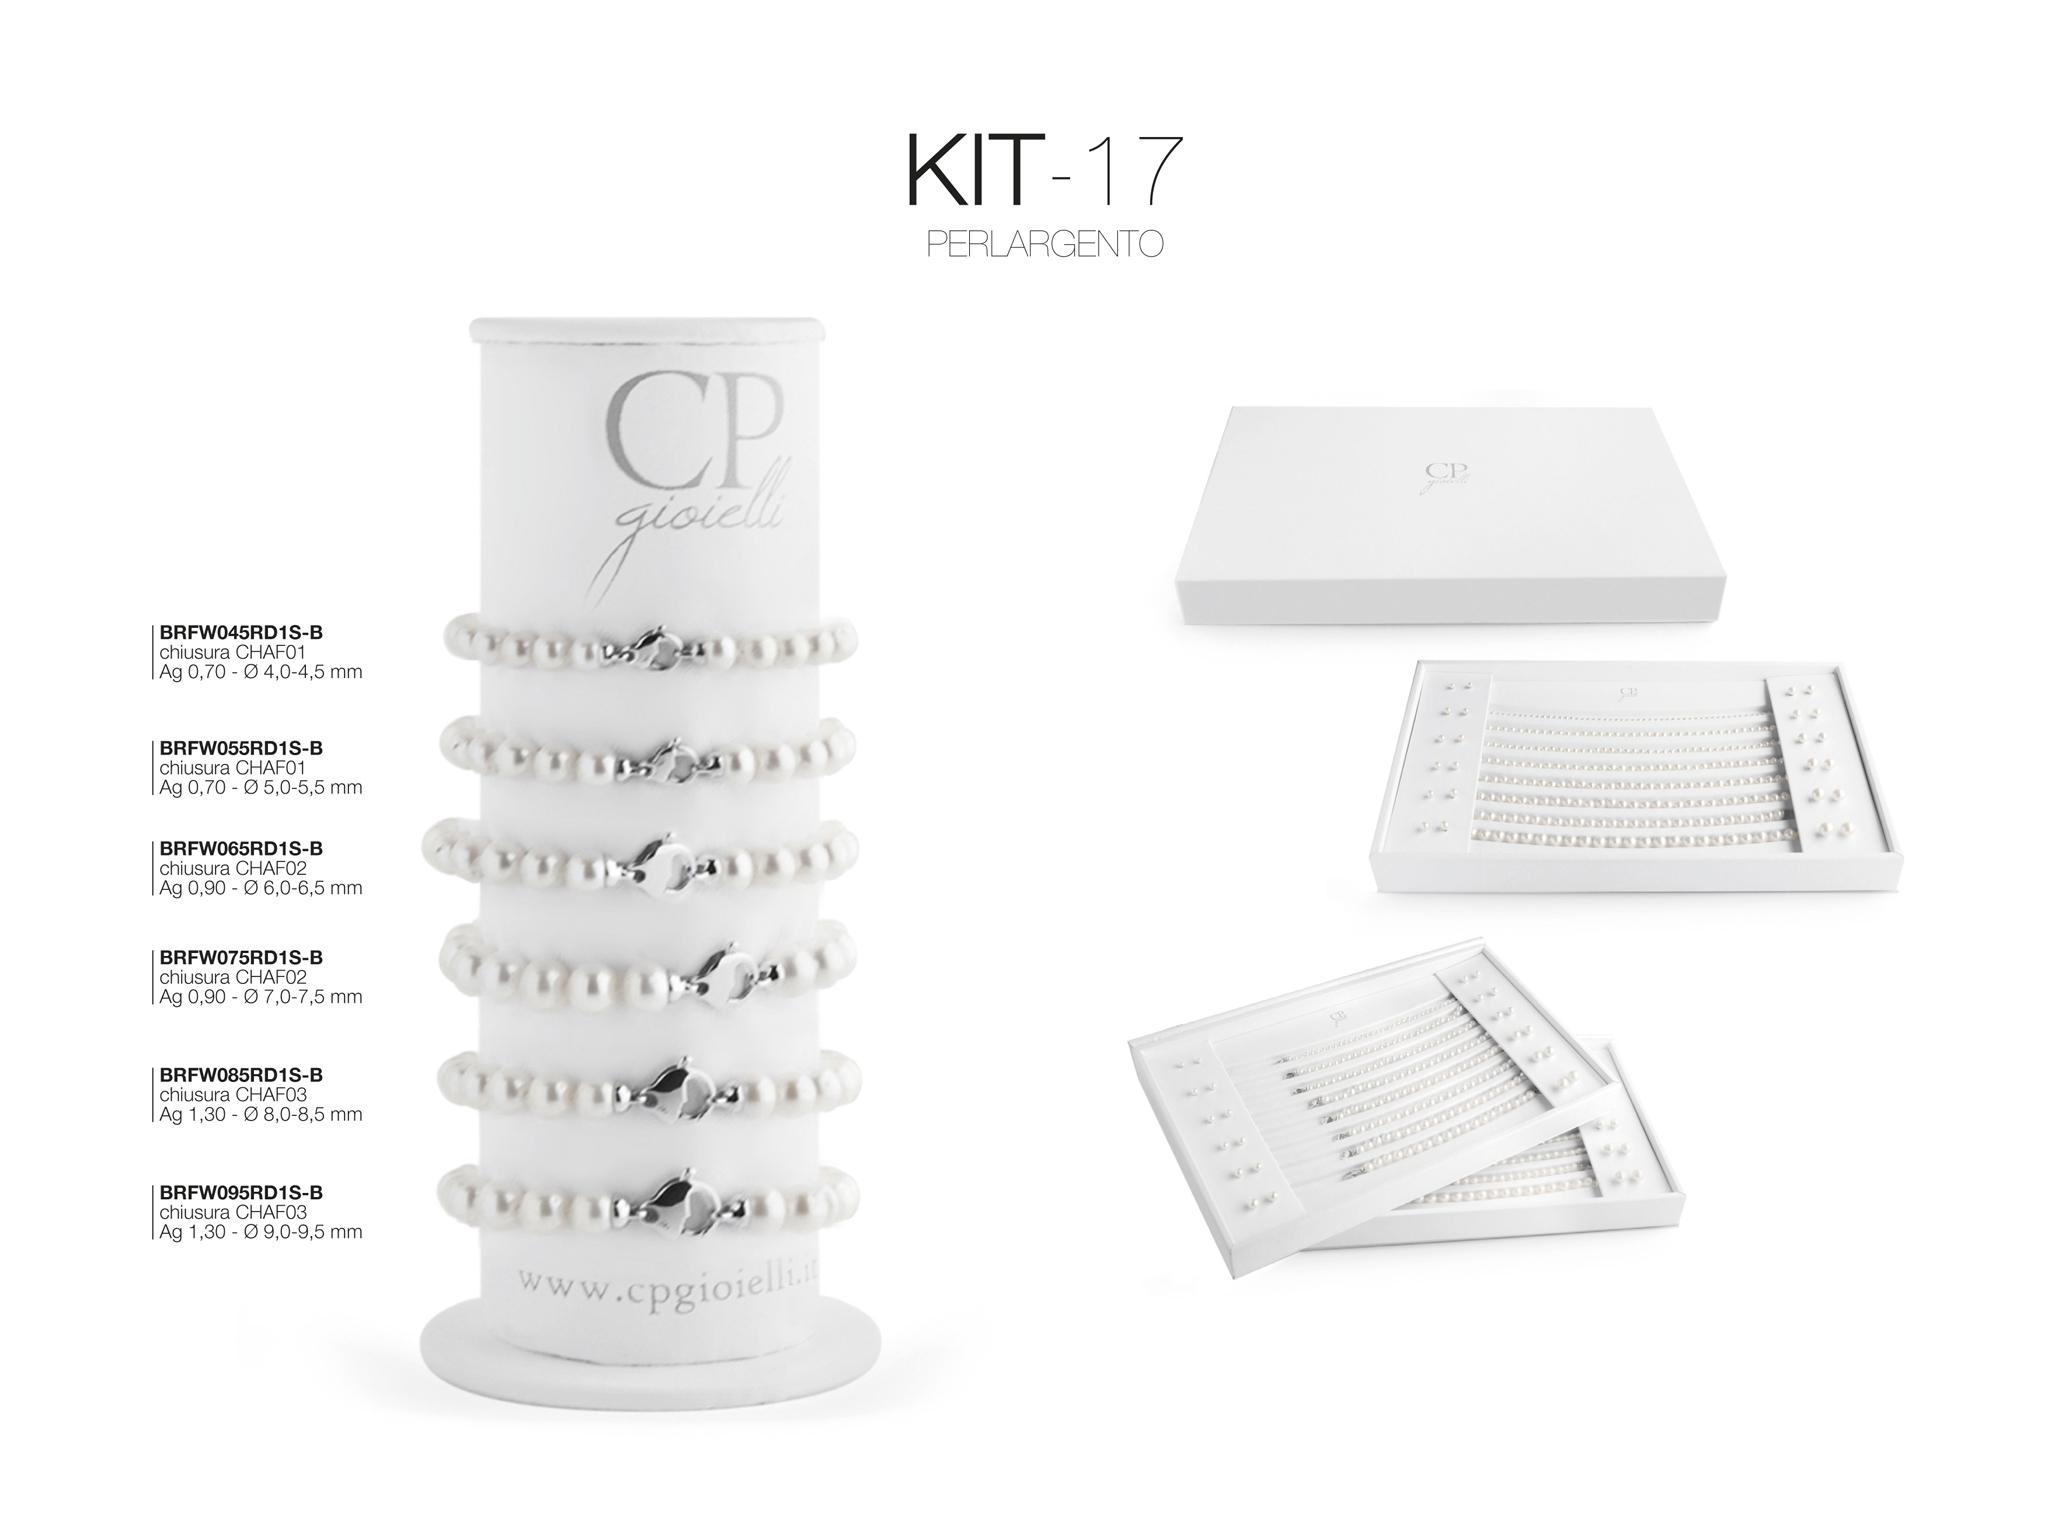 kit_argento_3.0_2016_pagina_55_APP